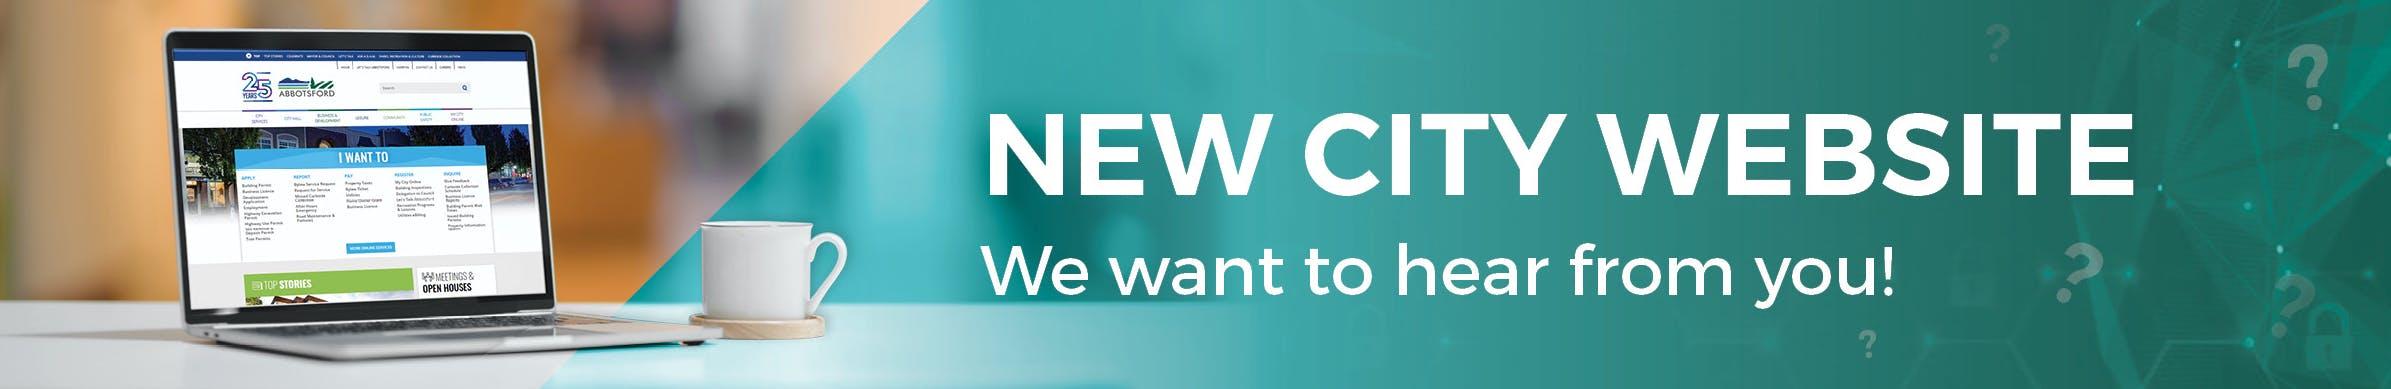 New City Website Engagement Banner